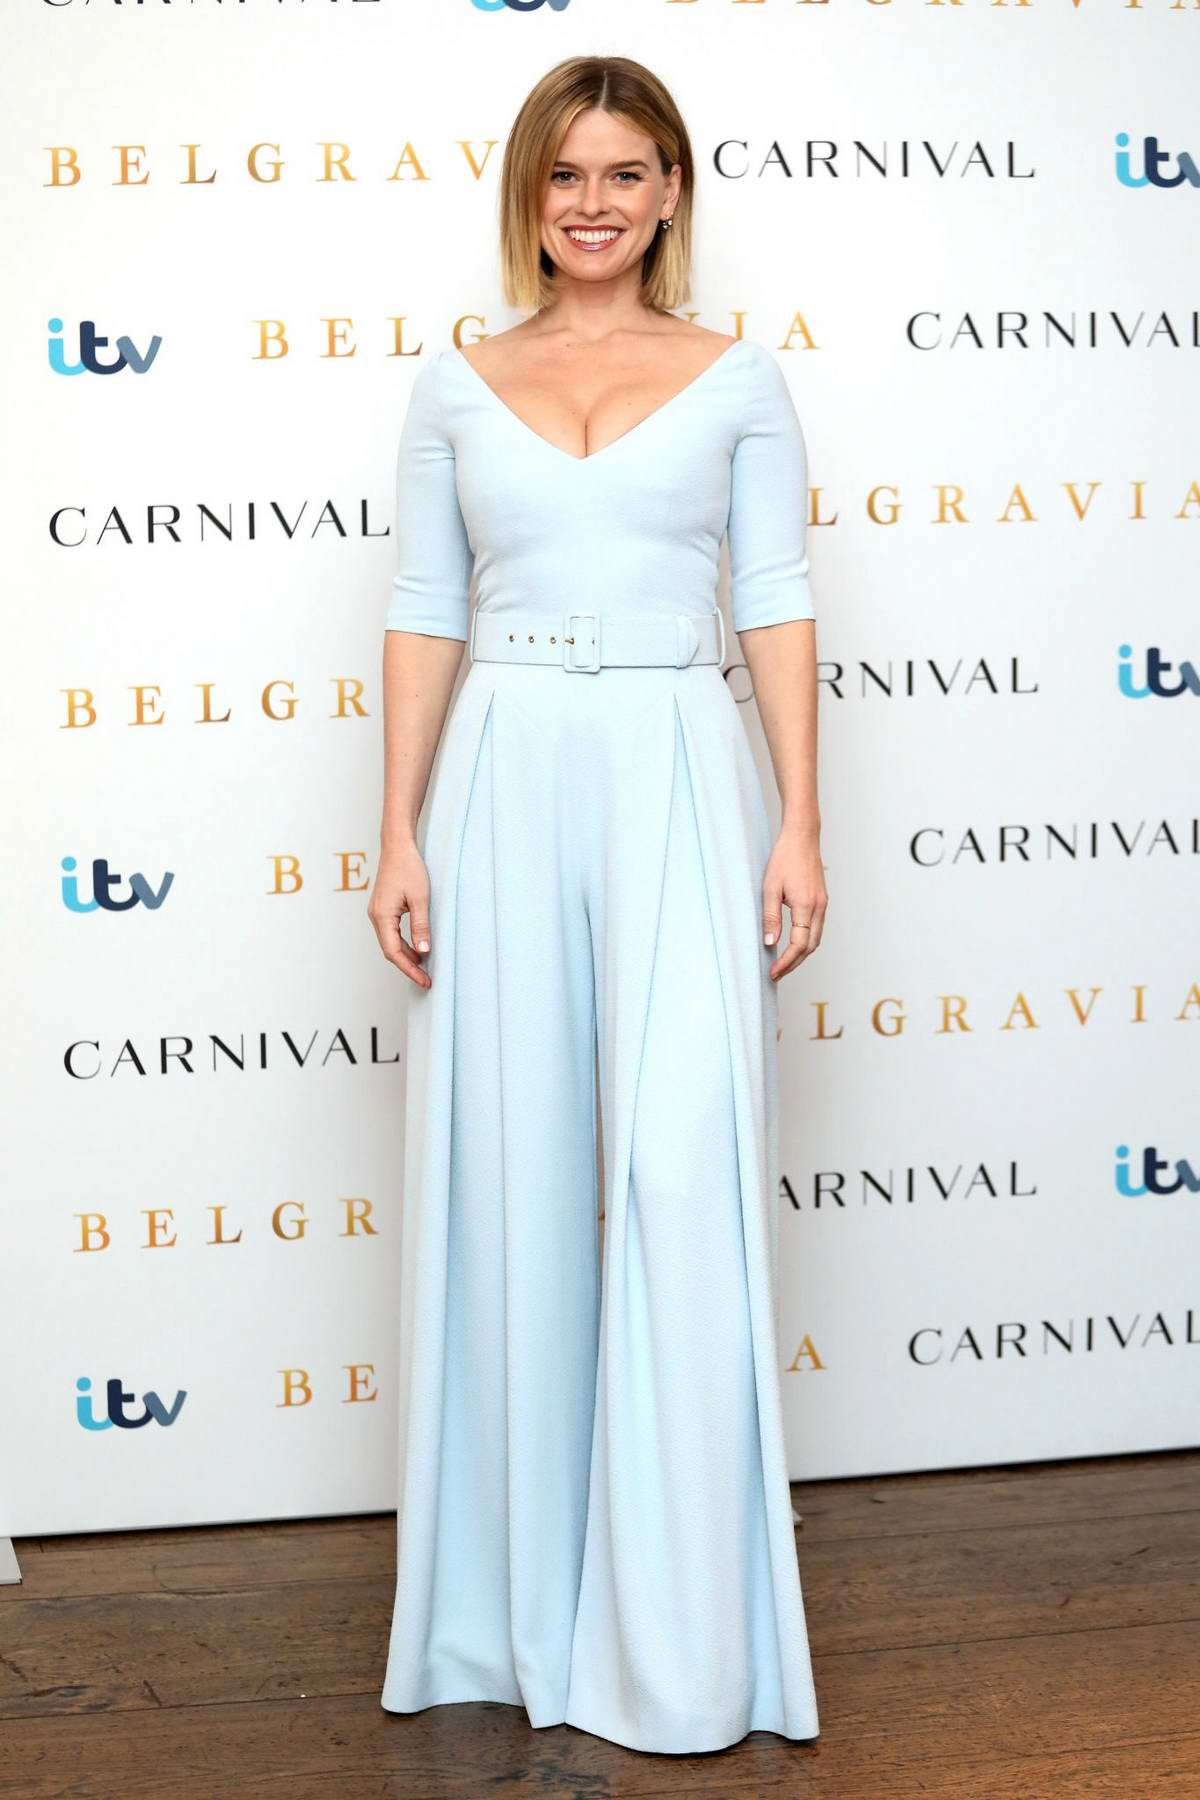 Alice Eve attends 'Belgravia' Photocall in London, UK